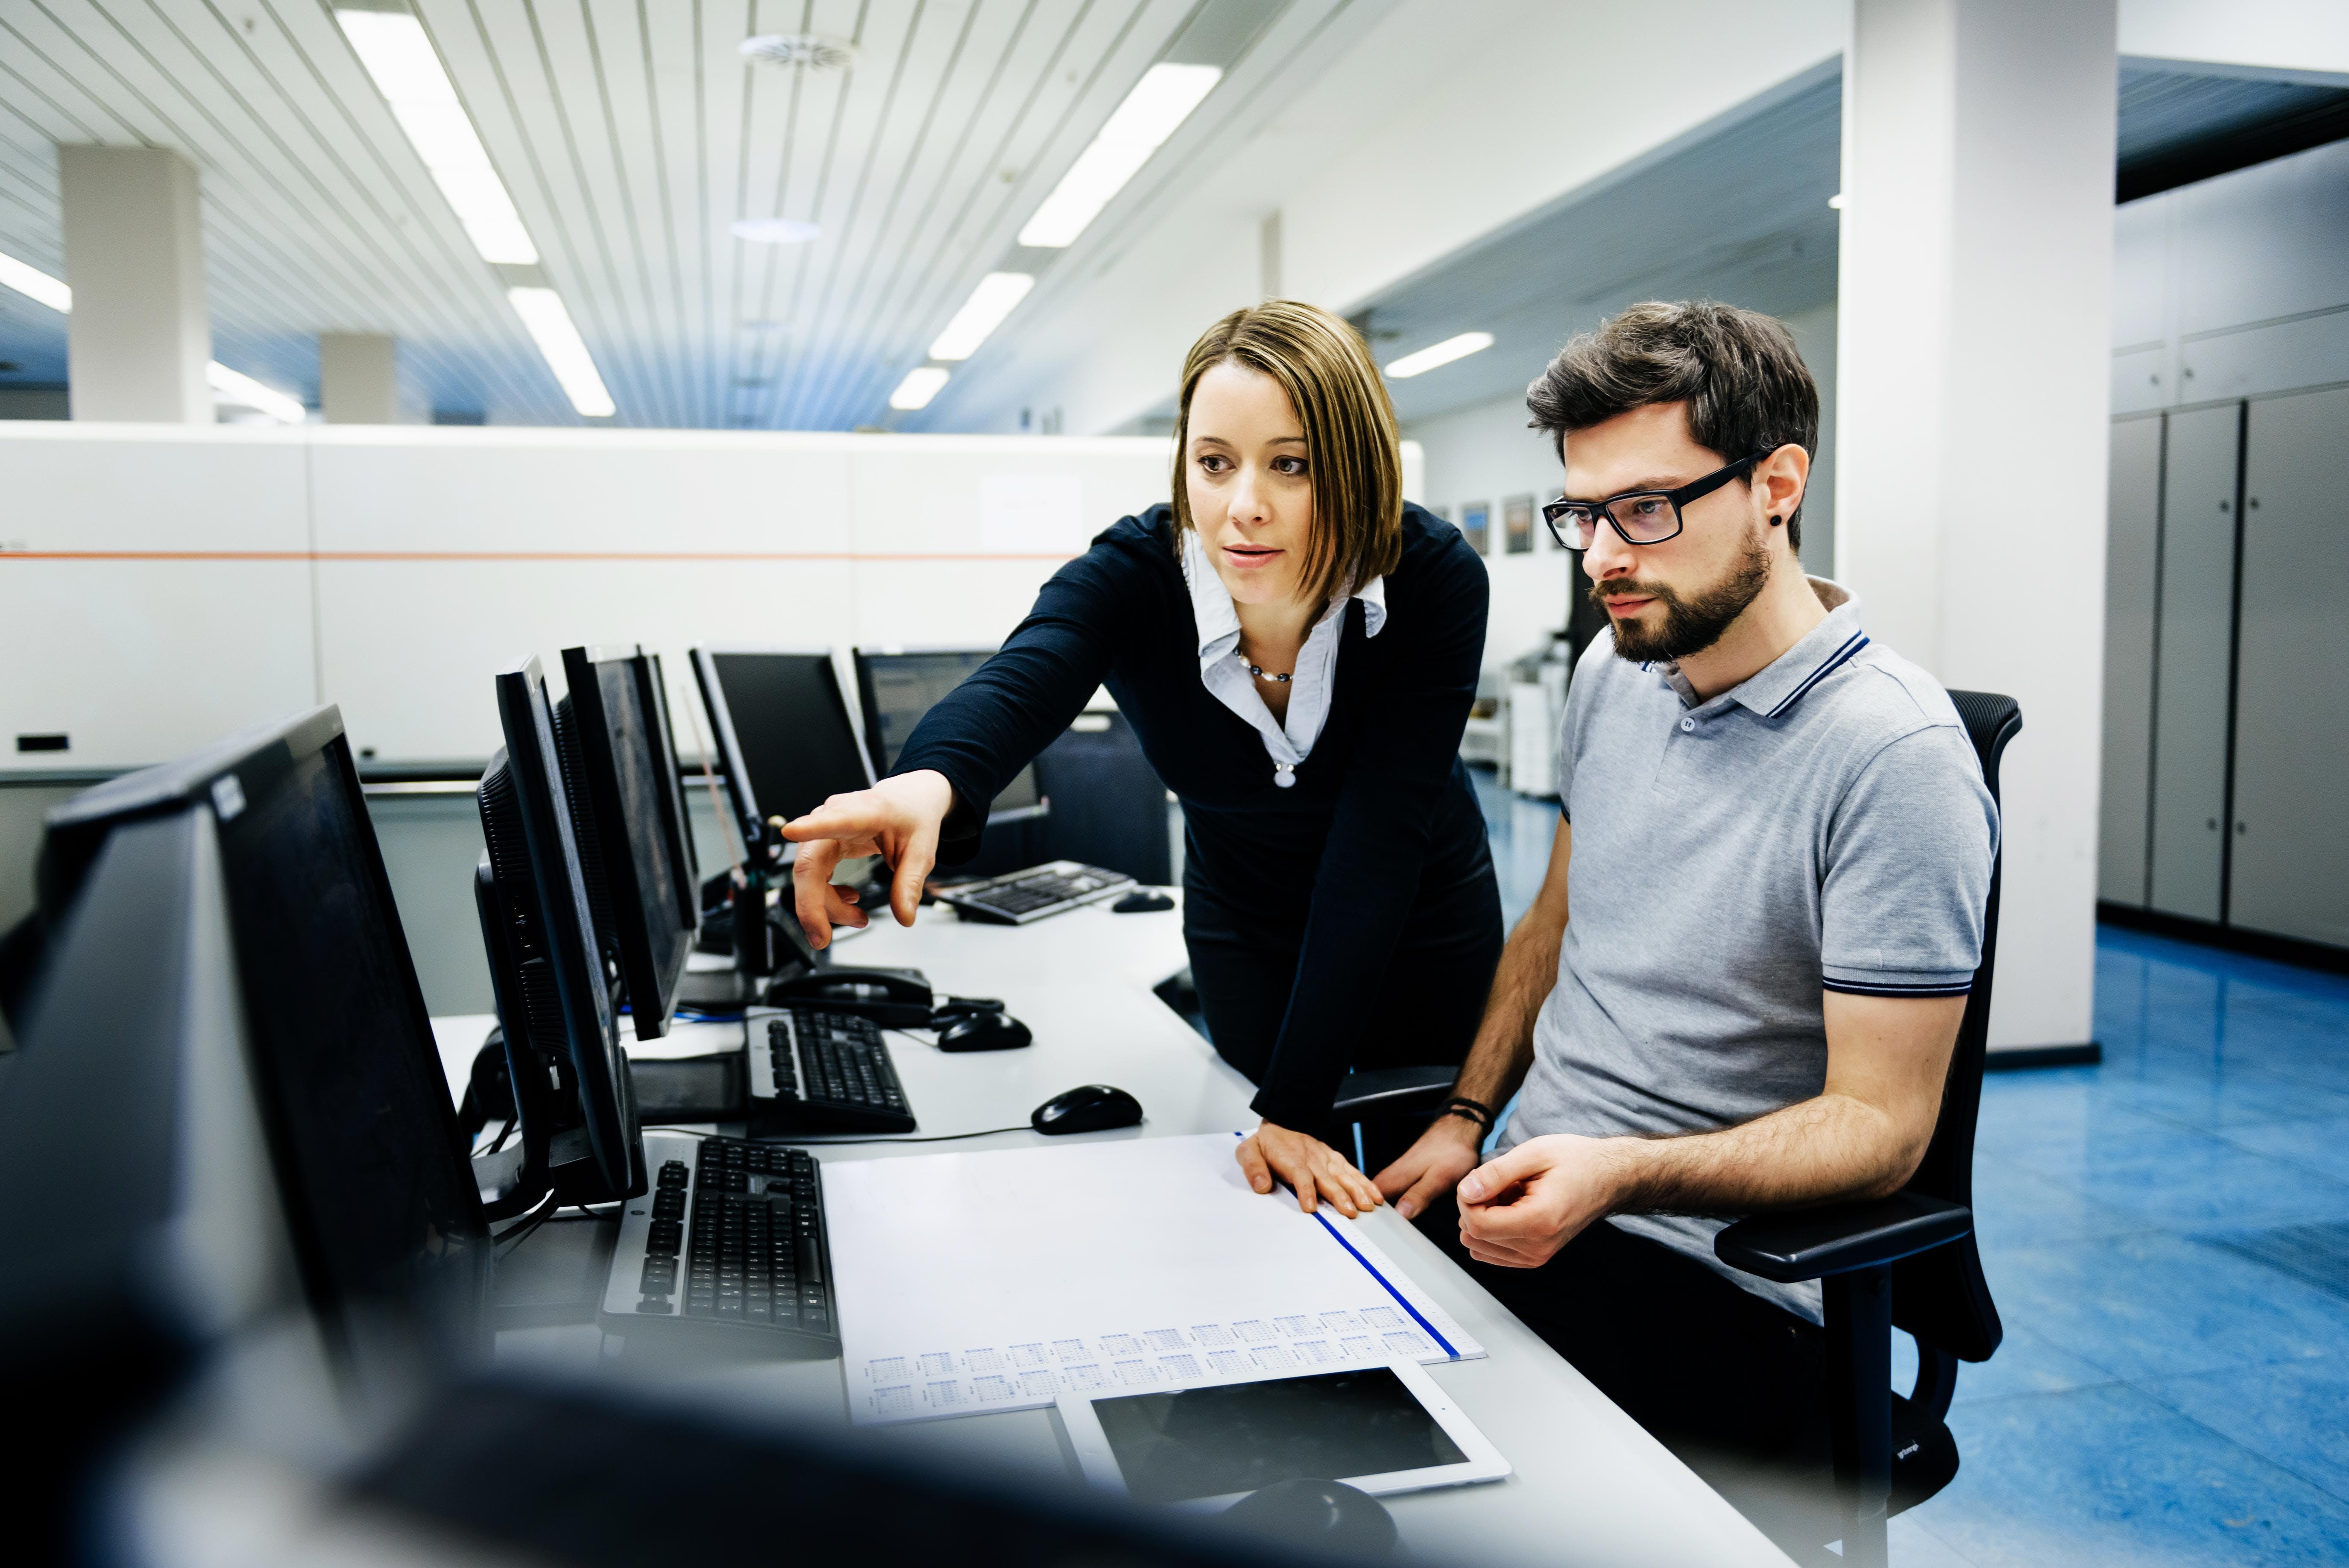 information technology professionals capi - HD1254×837